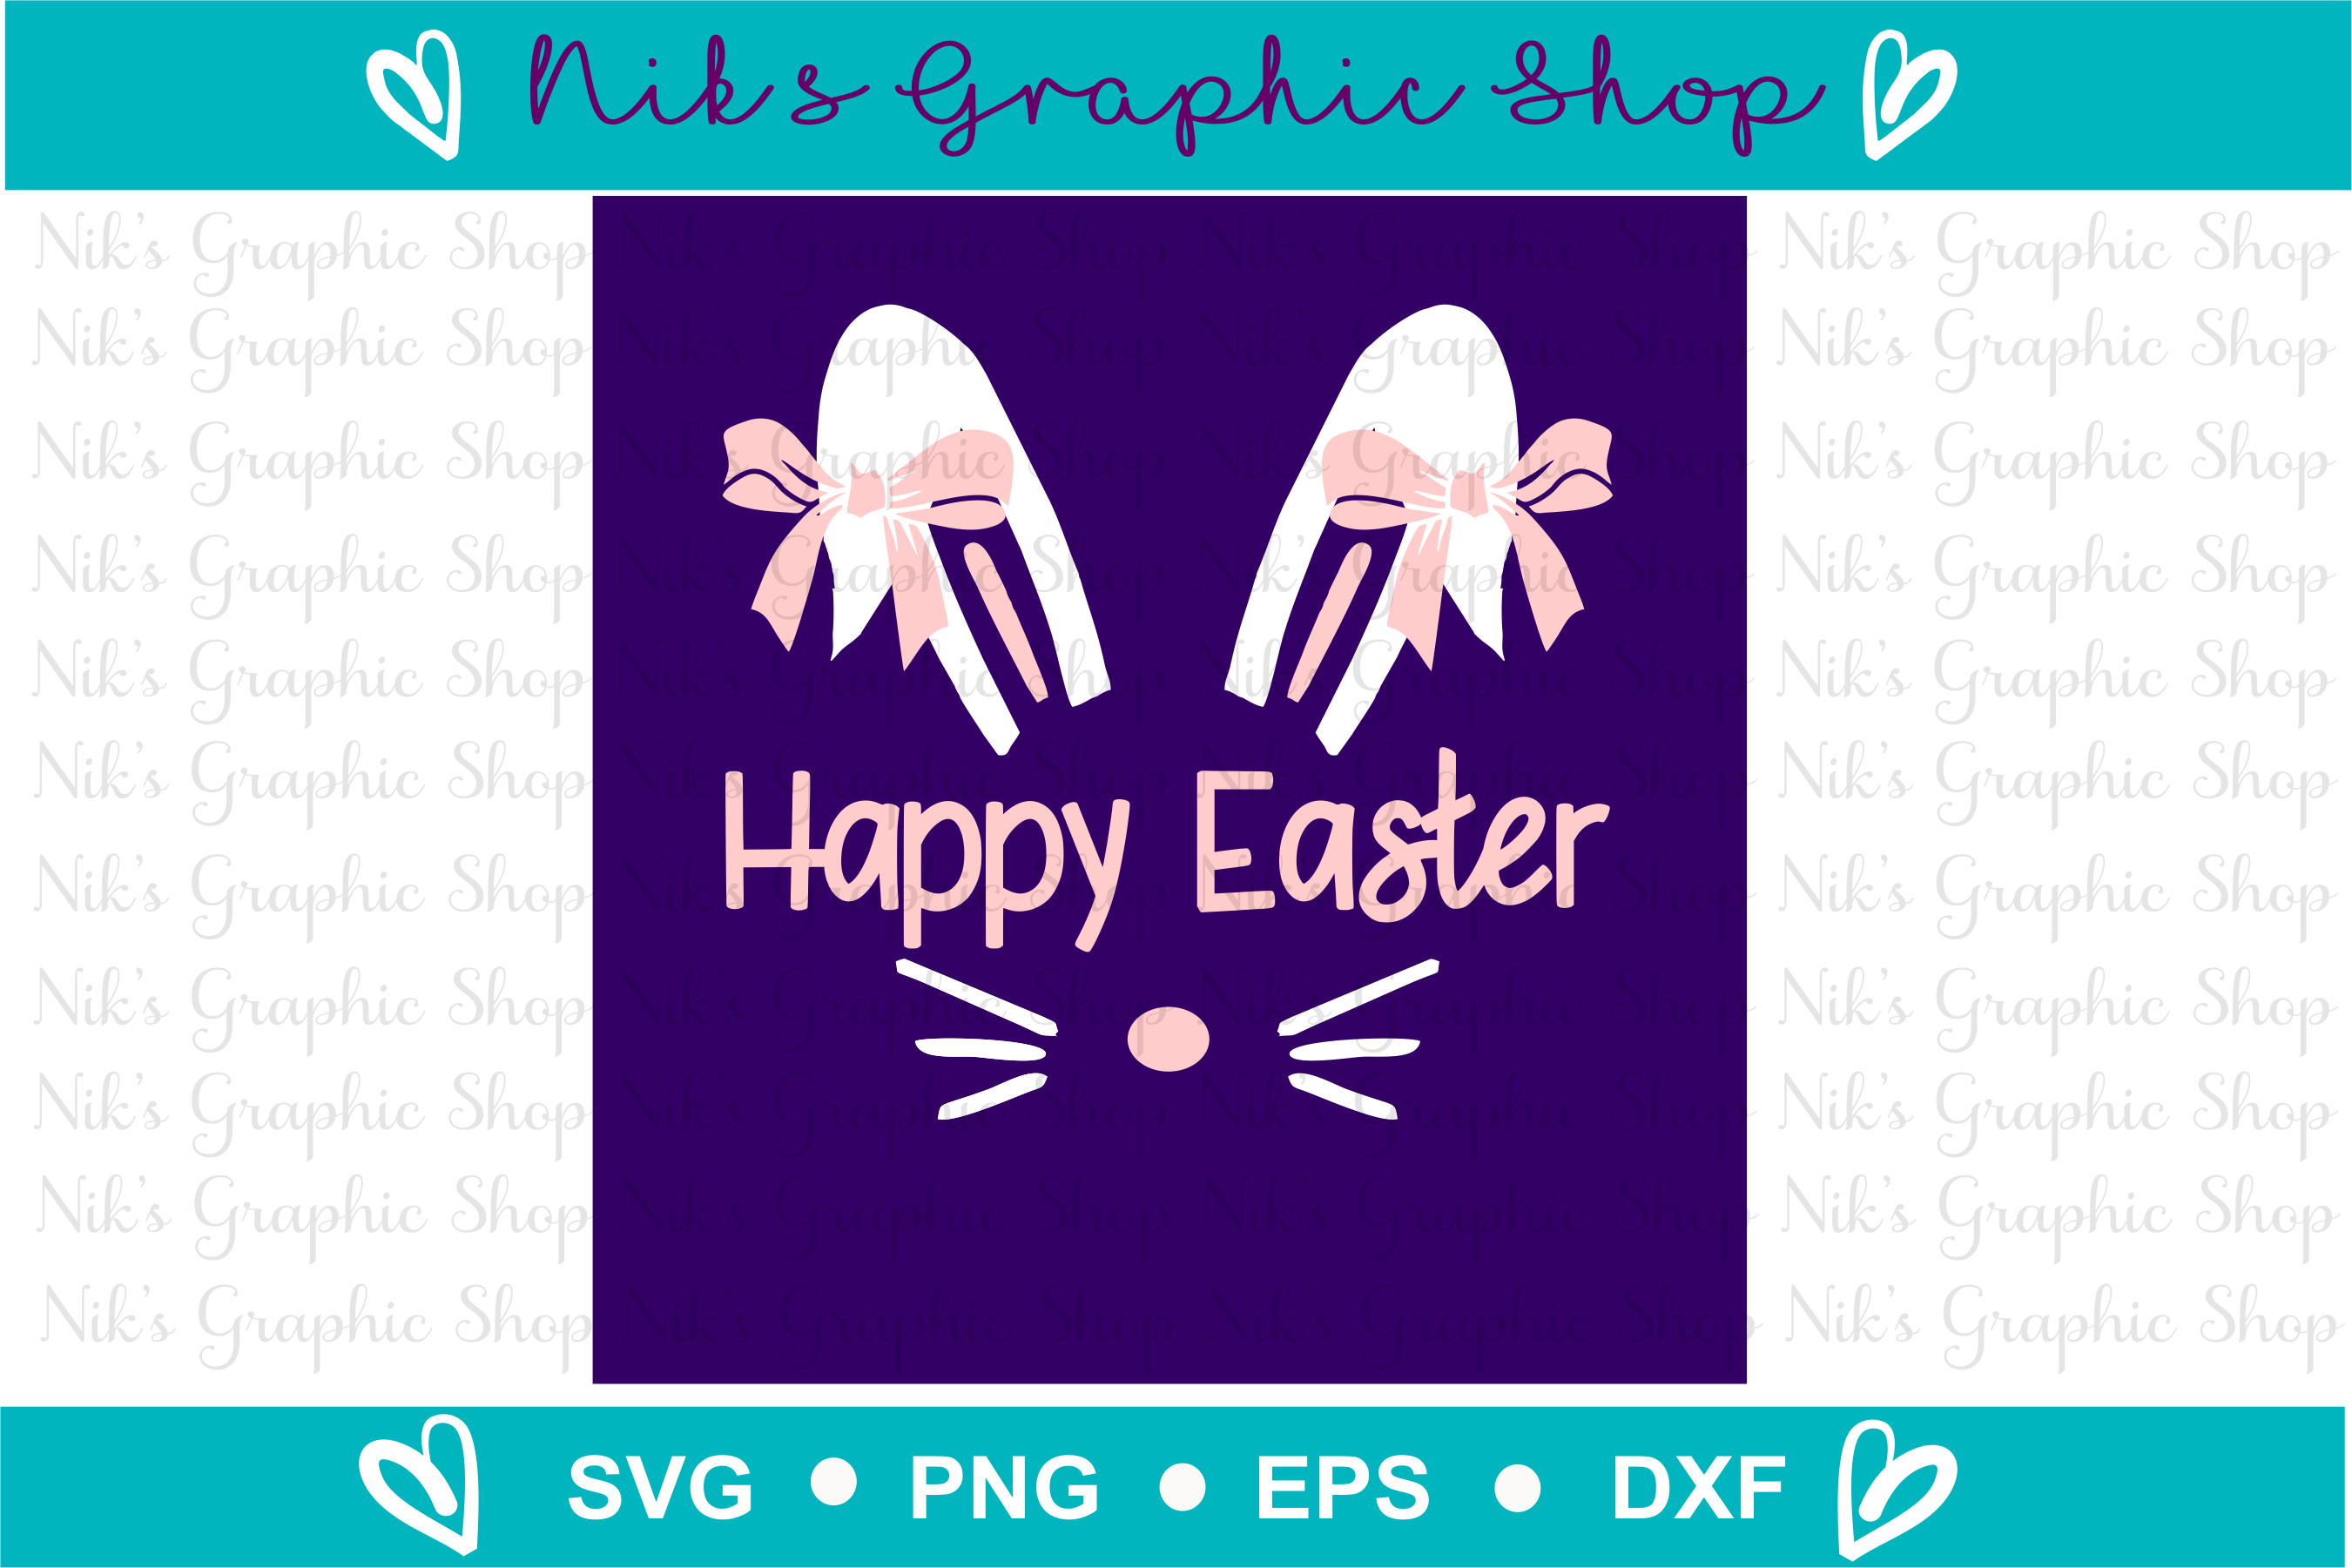 Easter bunny svg, Easter Svg, Bunny Svg, Easter Graphic example image 2